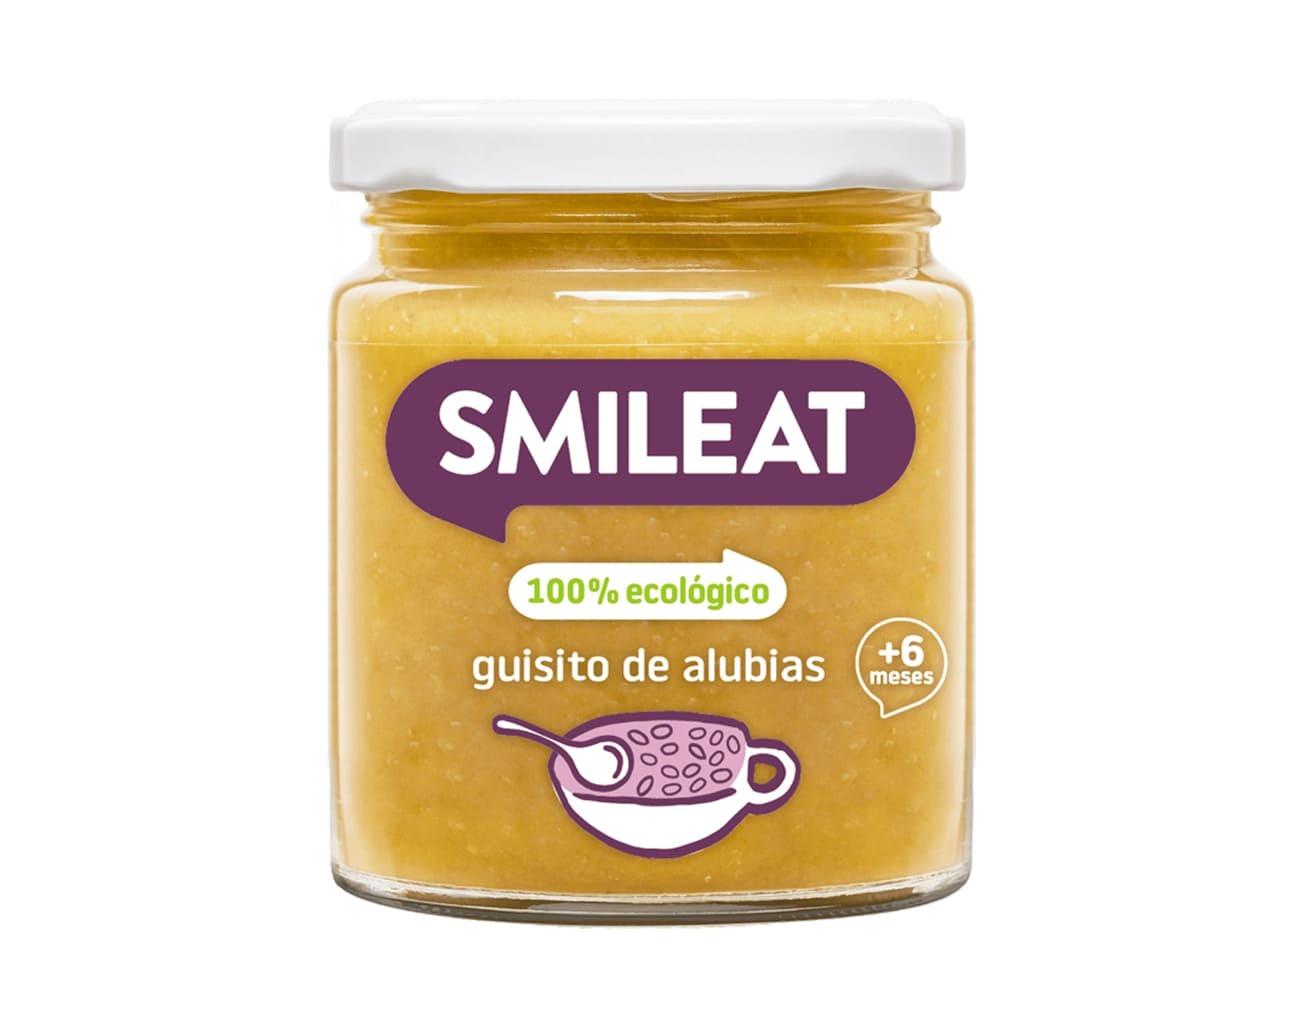 POTITO BIO GUISO DE ALUBIAS  230 G ( y 8MESES) SMILEAT en Biovegalia